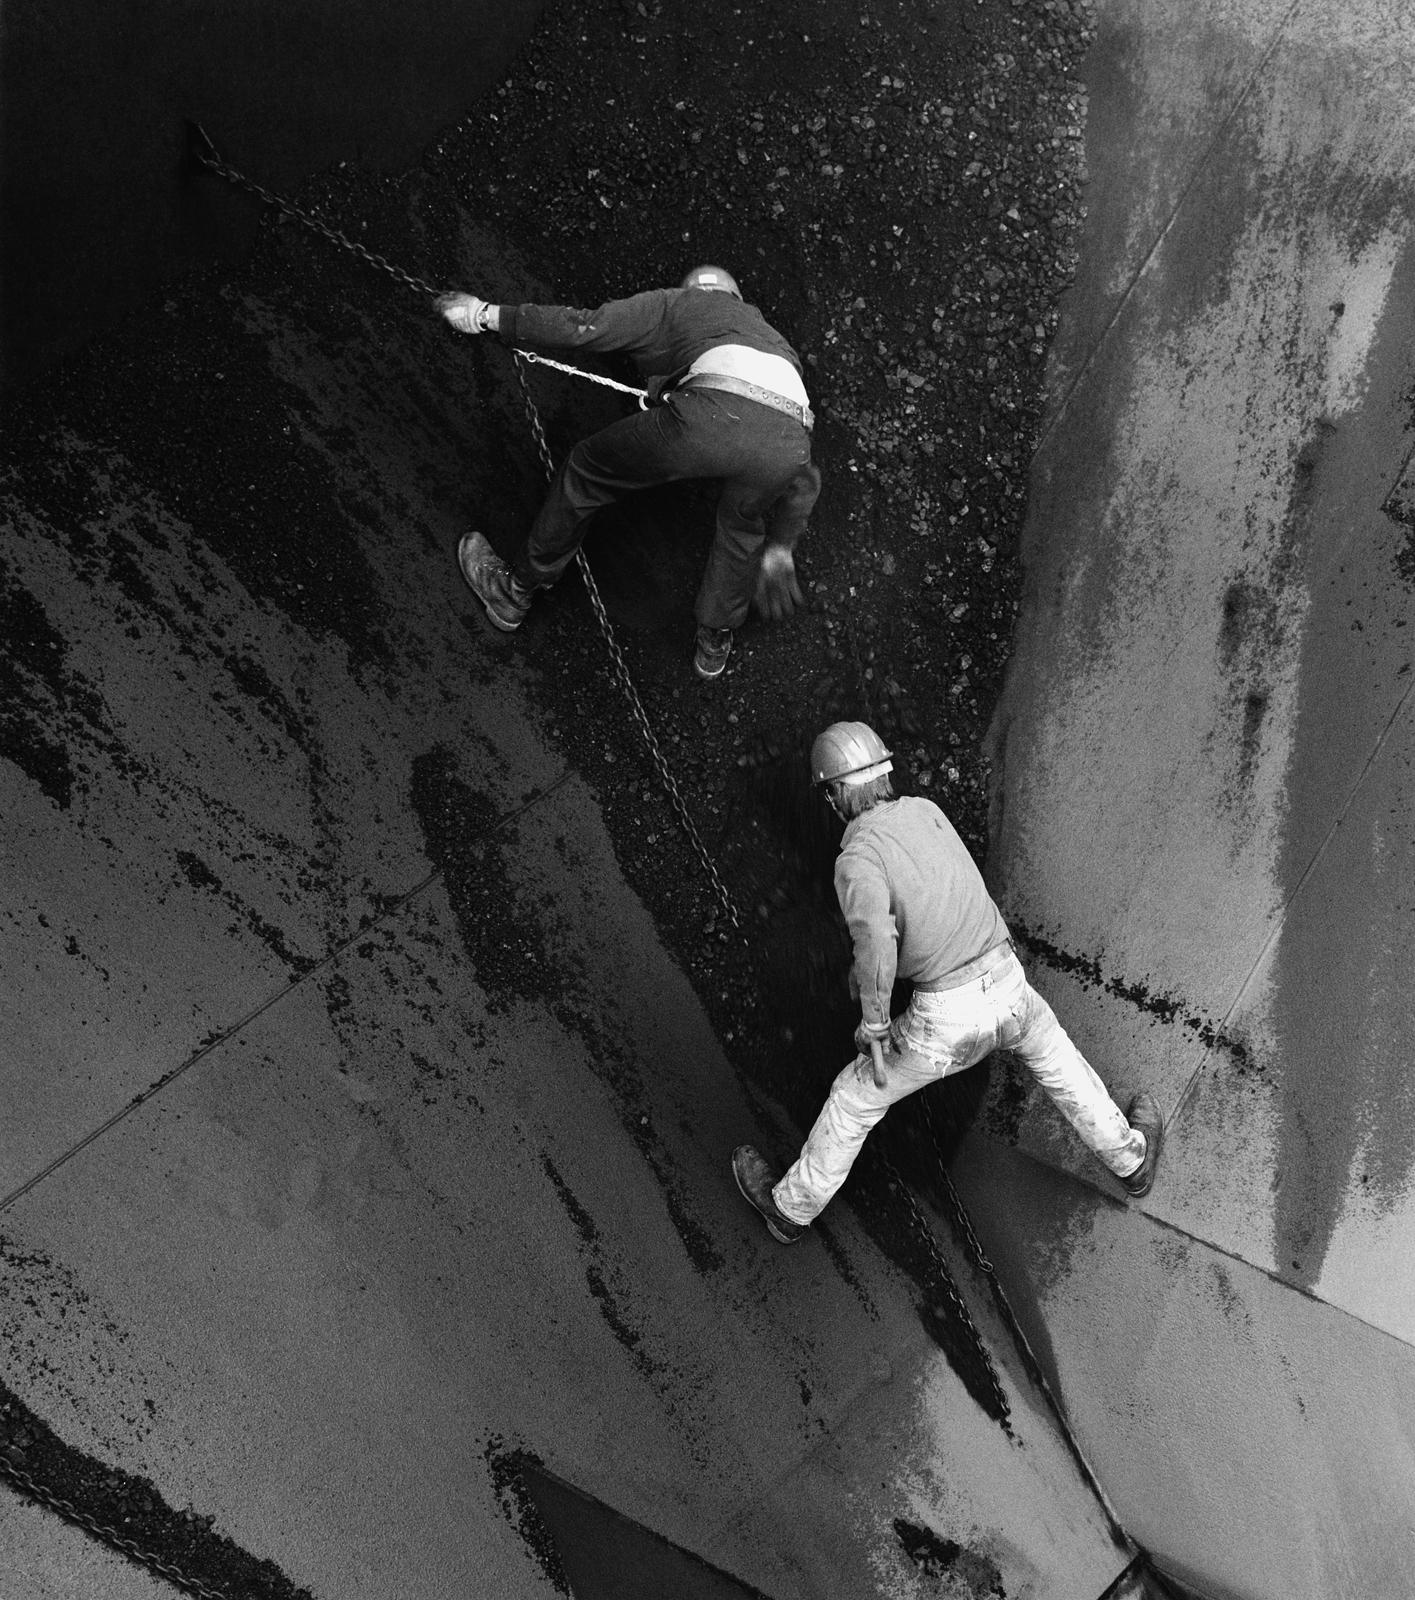 Cleaning Cargo Hold, Steamer Crispin Oglebay,1989